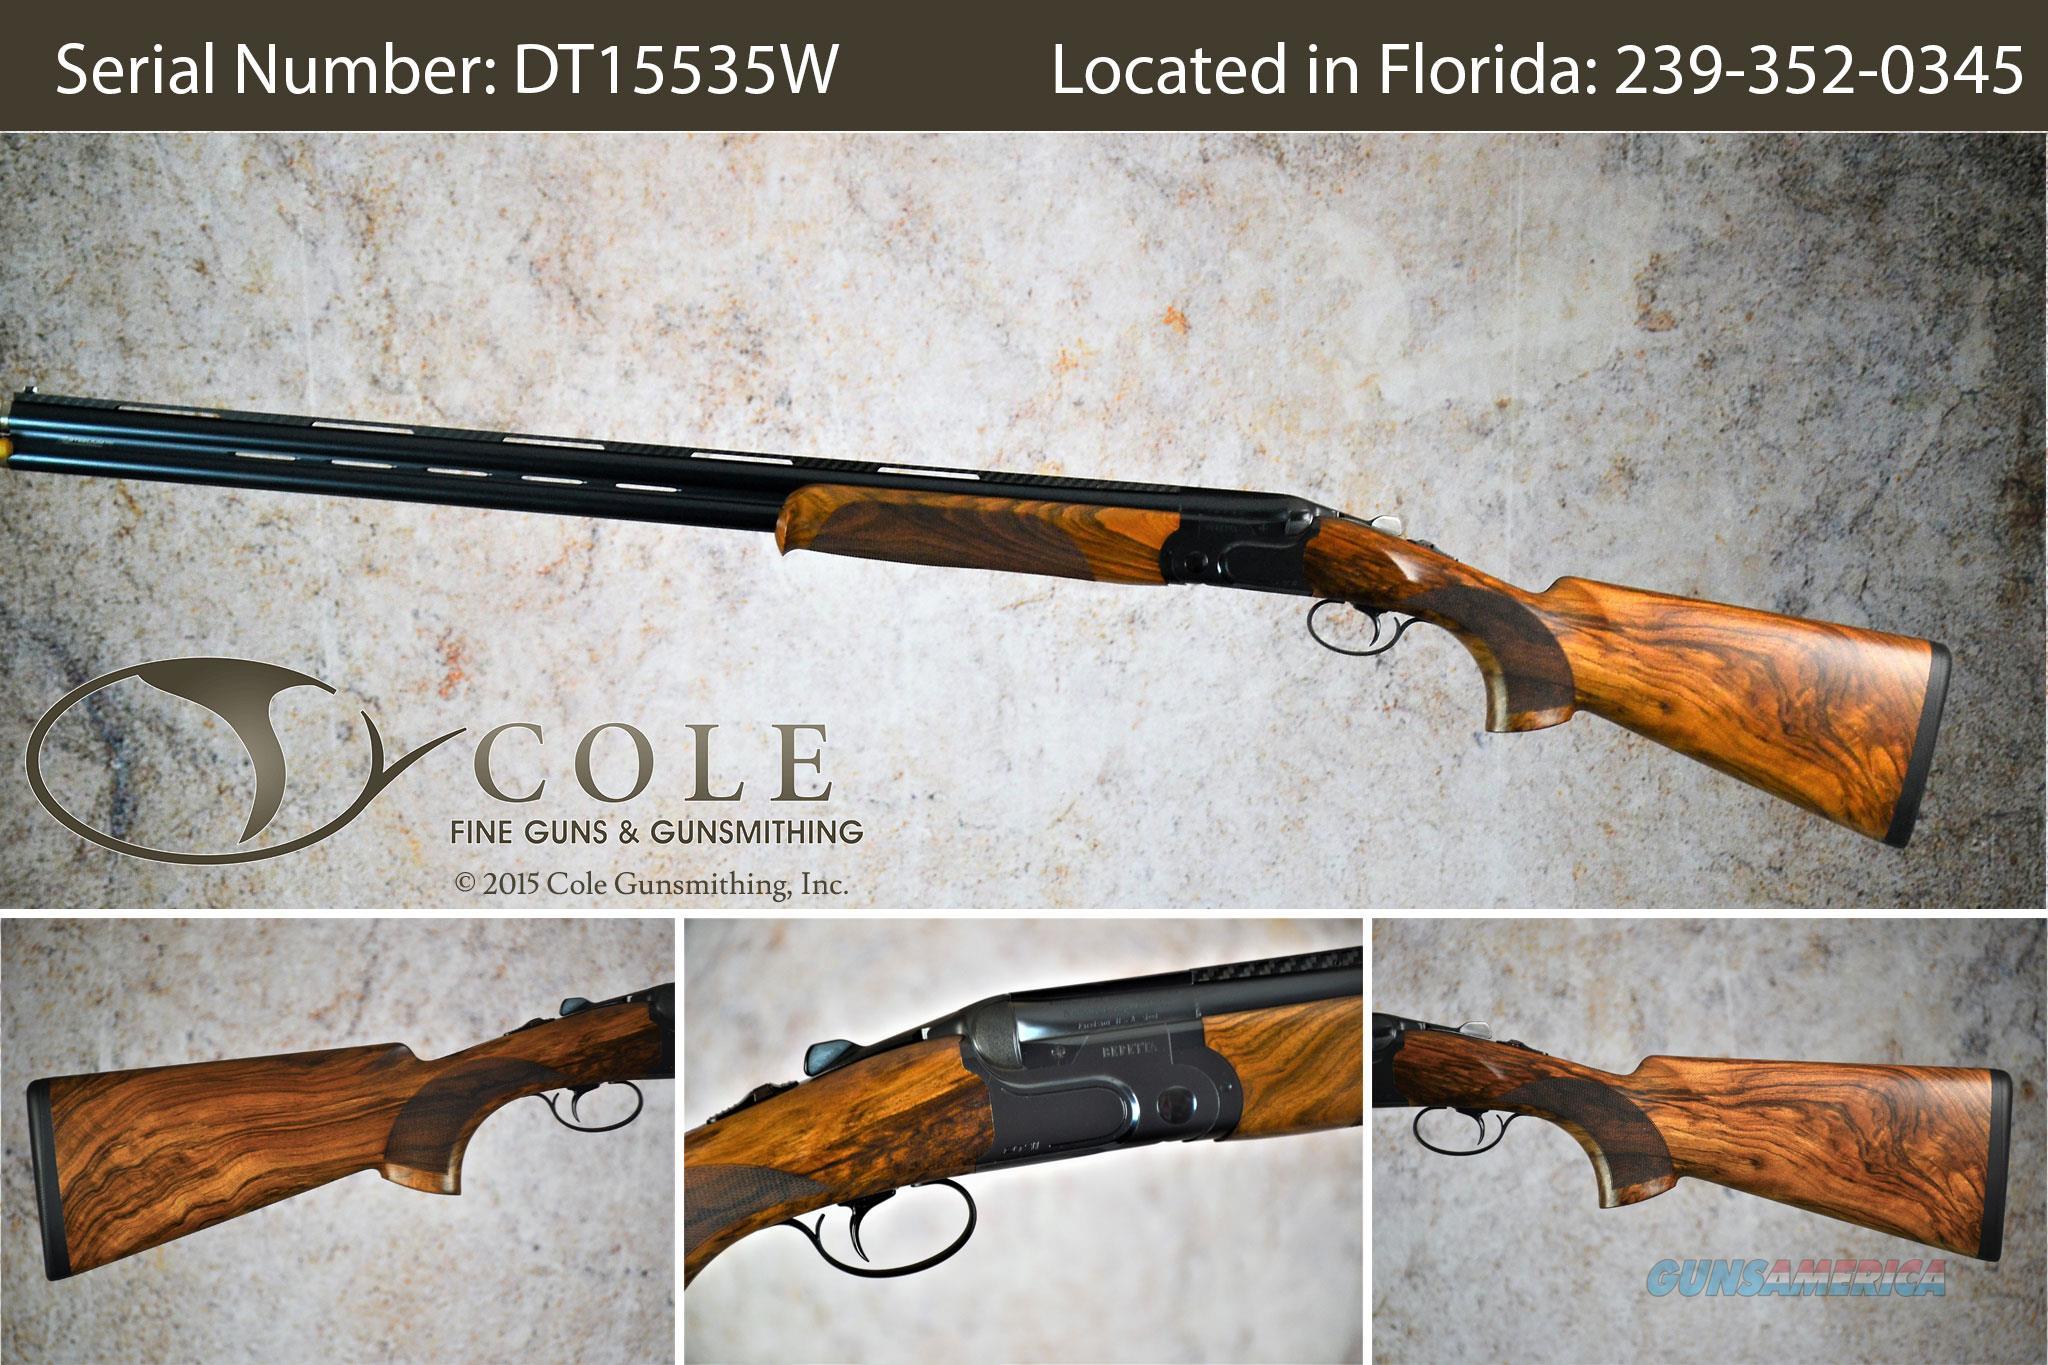 "Beretta DT11 Sporting 12g 32"" Black Edition SN:#DT15535W  Guns > Shotguns > Beretta Shotguns > O/U > Trap/Skeet"